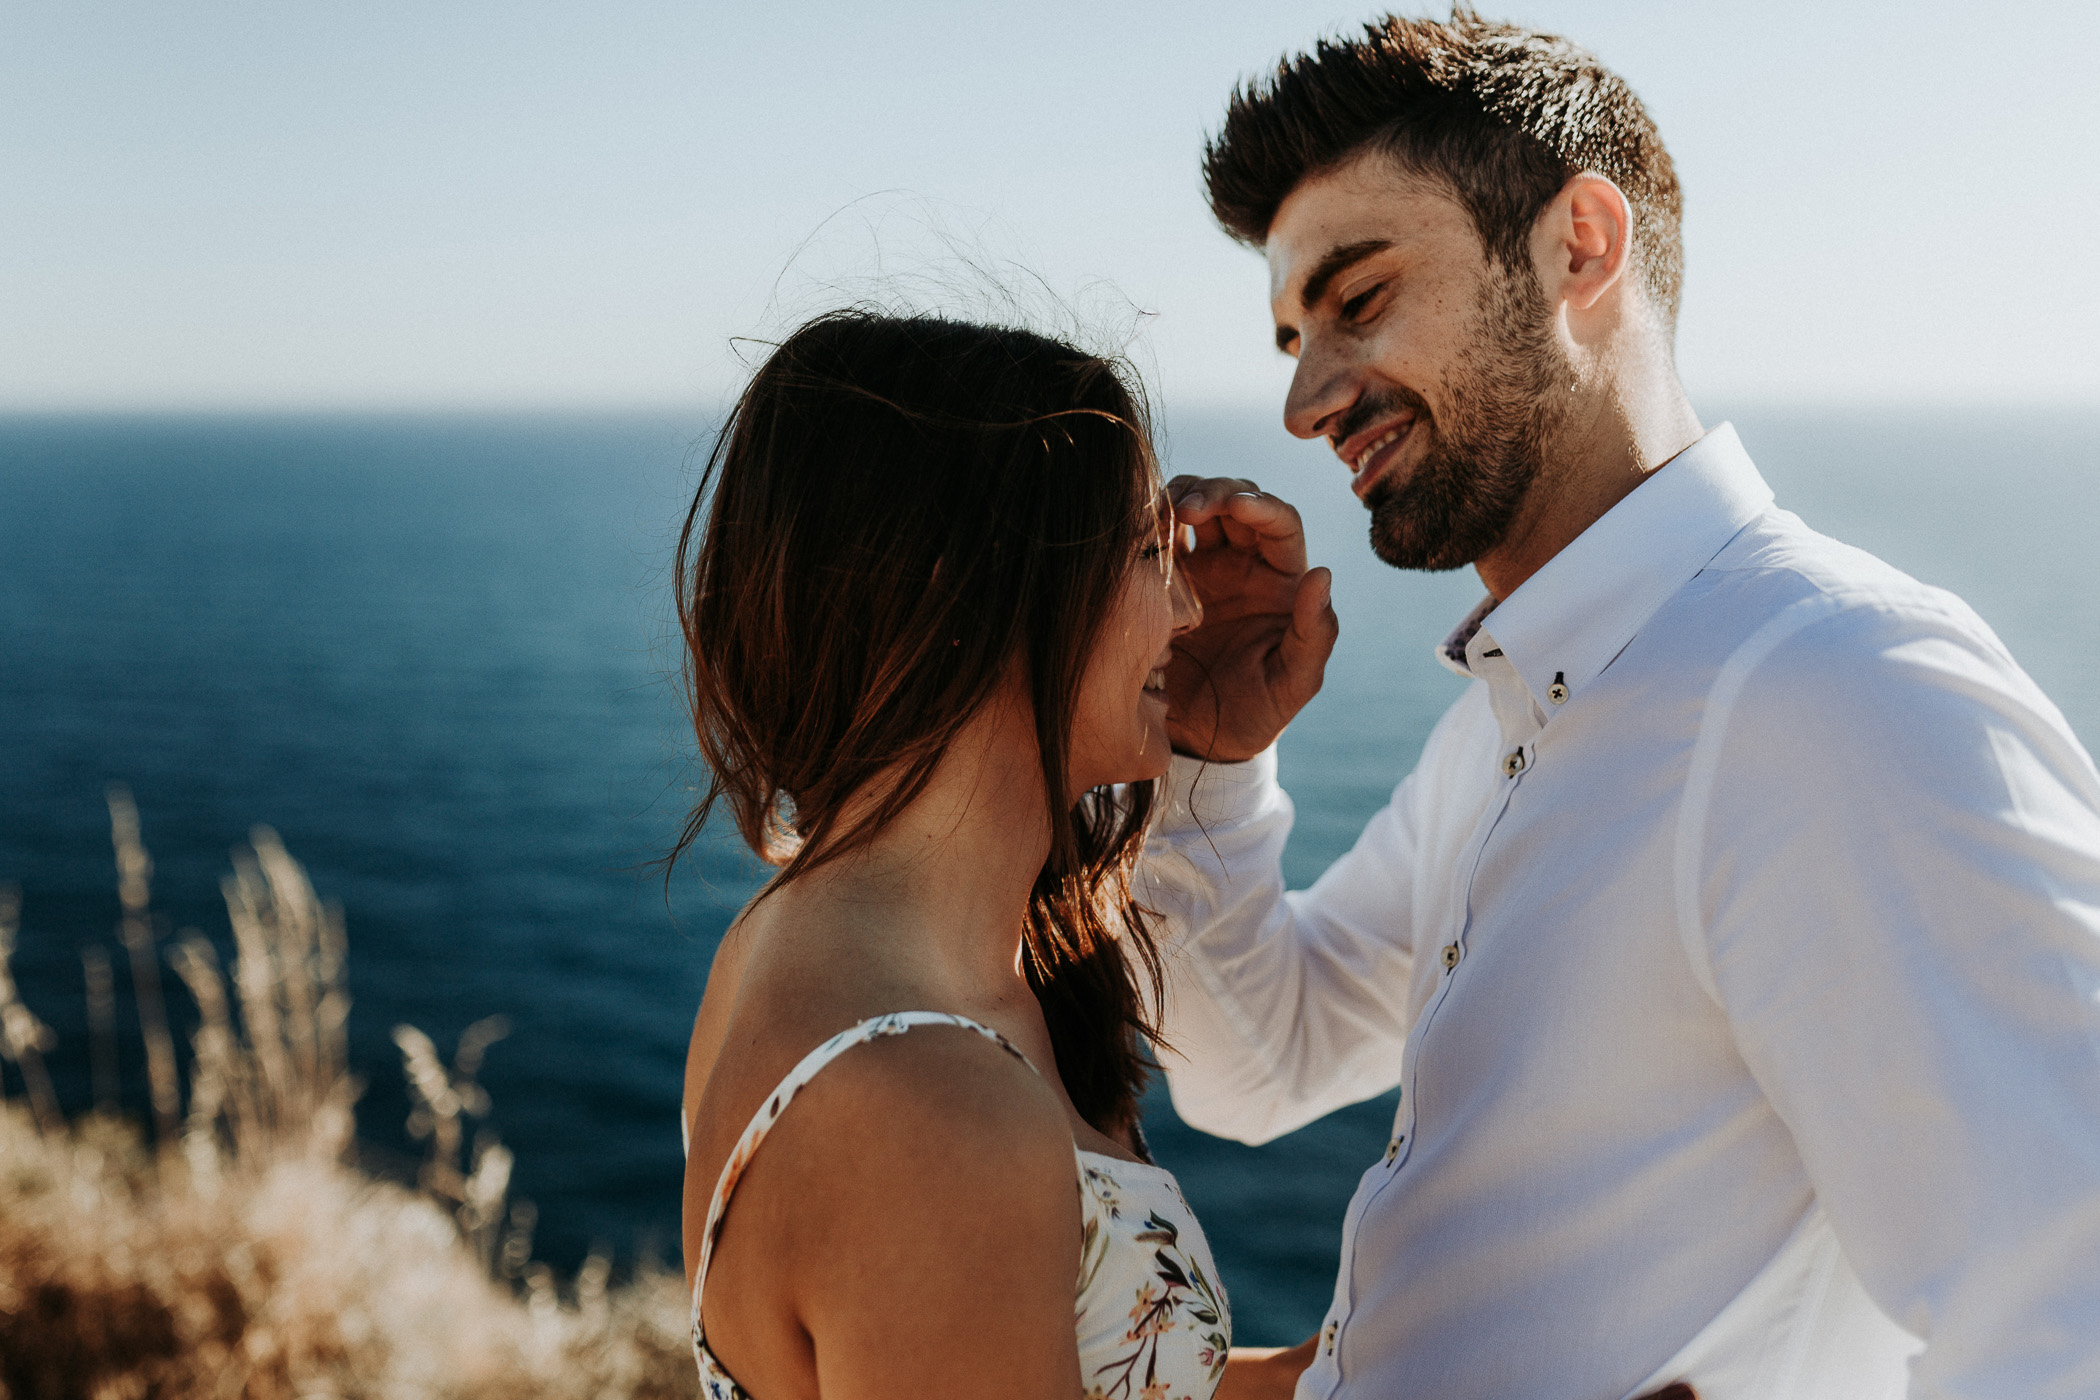 DanielaMarquardtPhotography_wedding_elopement_mallorca_spain_calapi_palma_lauraandtoni_84